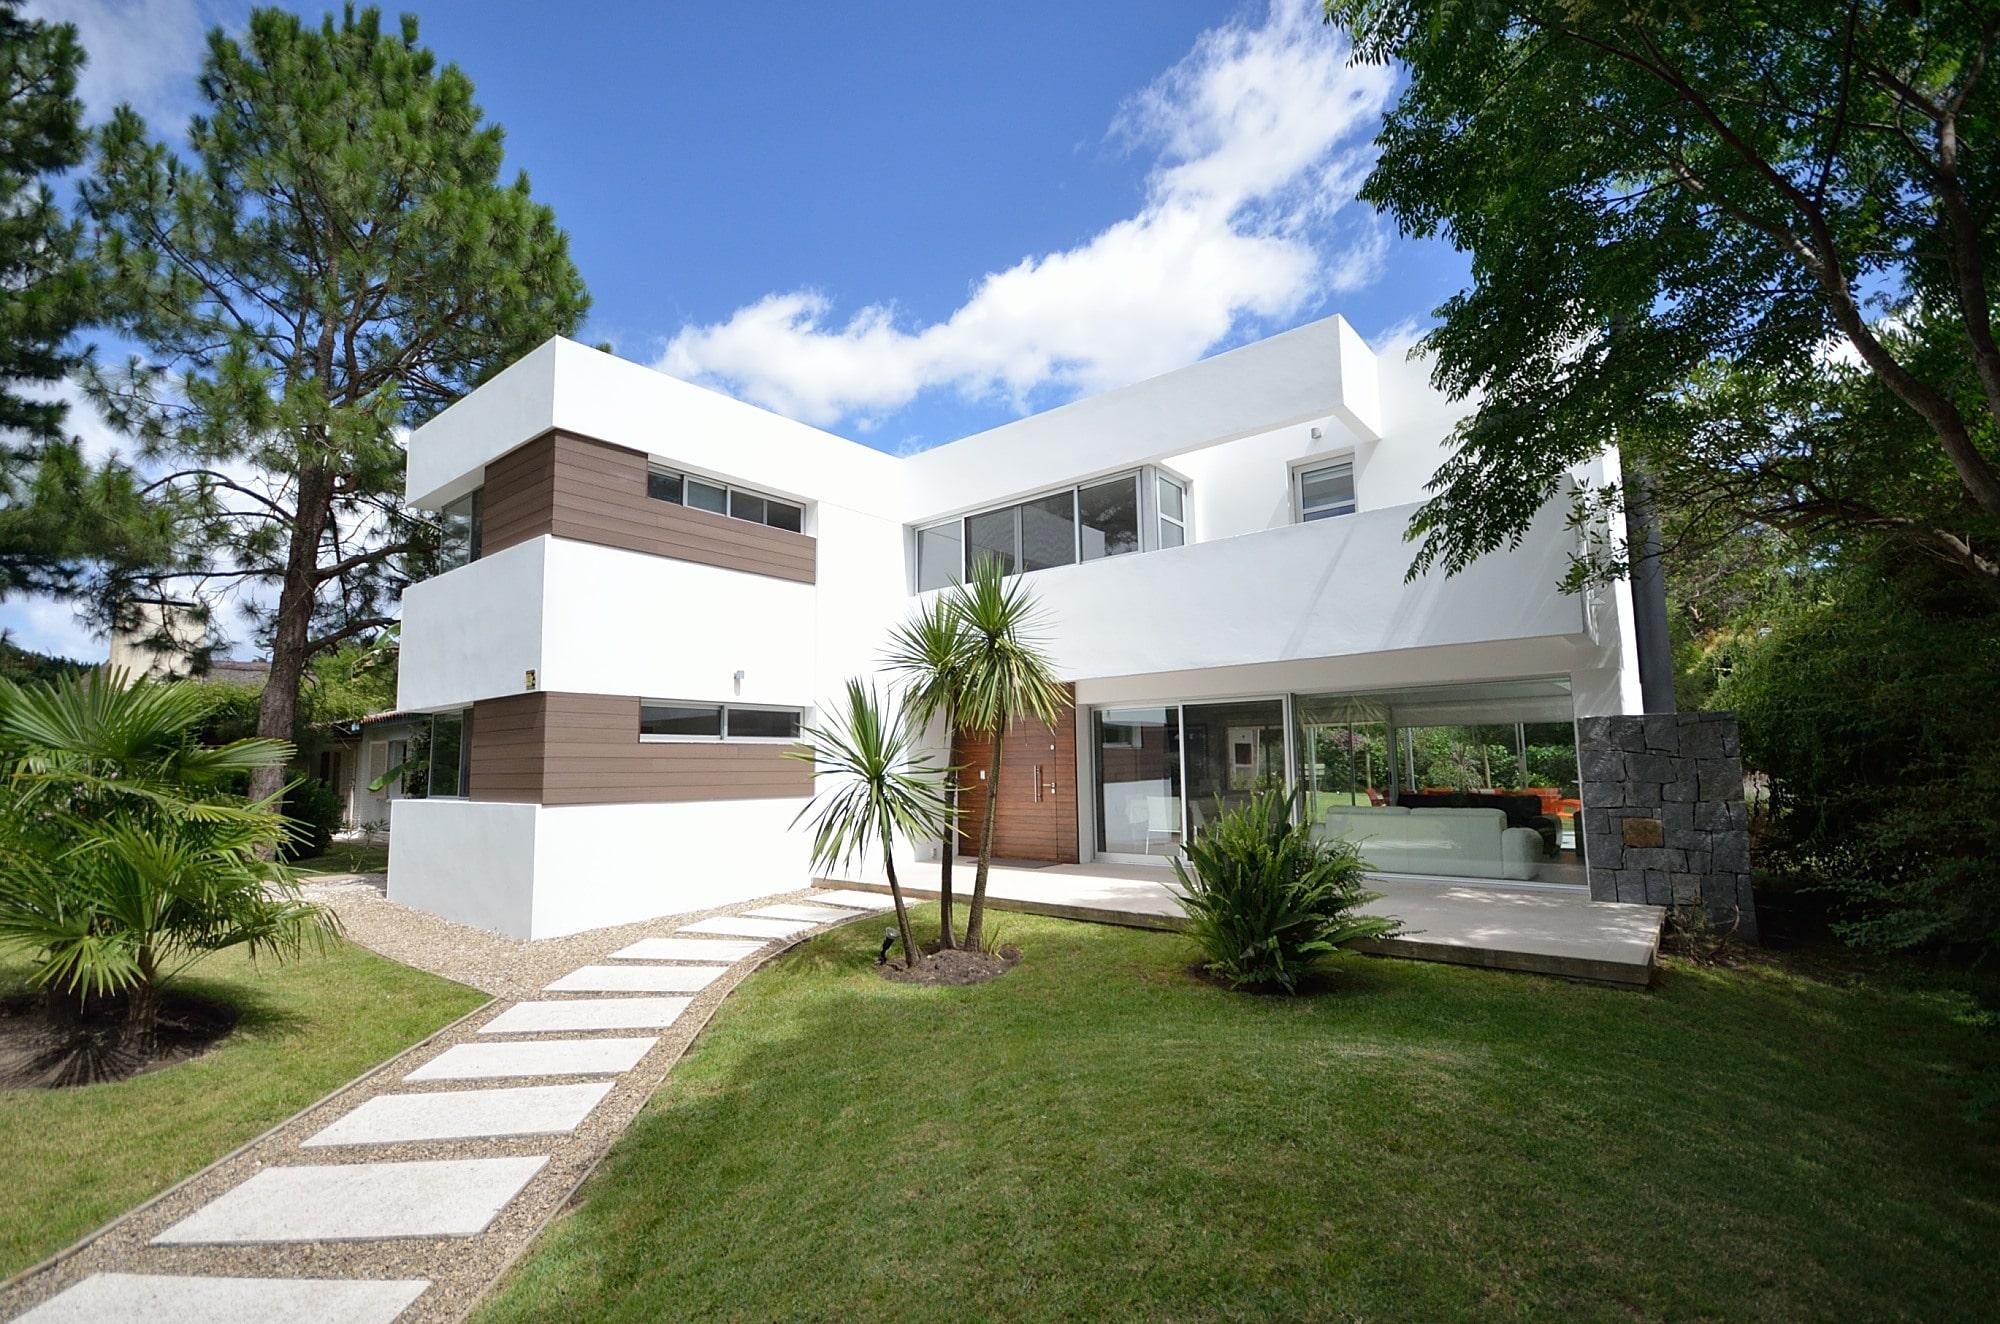 Nuevas fotos de la casa de estilo moderno brava house for La casa moderna